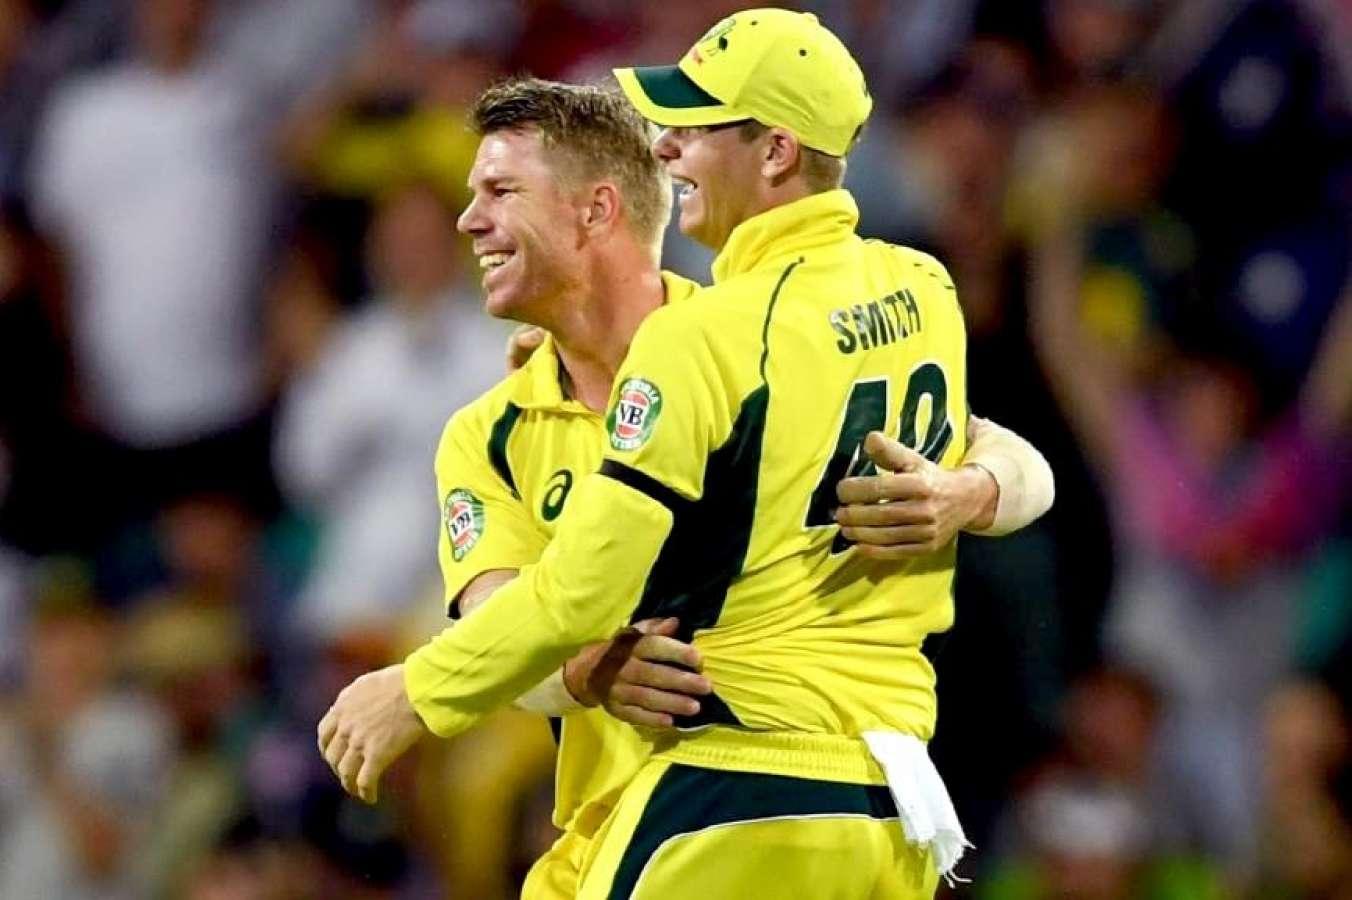 Australia vs England (1st ODI): Betting Guide